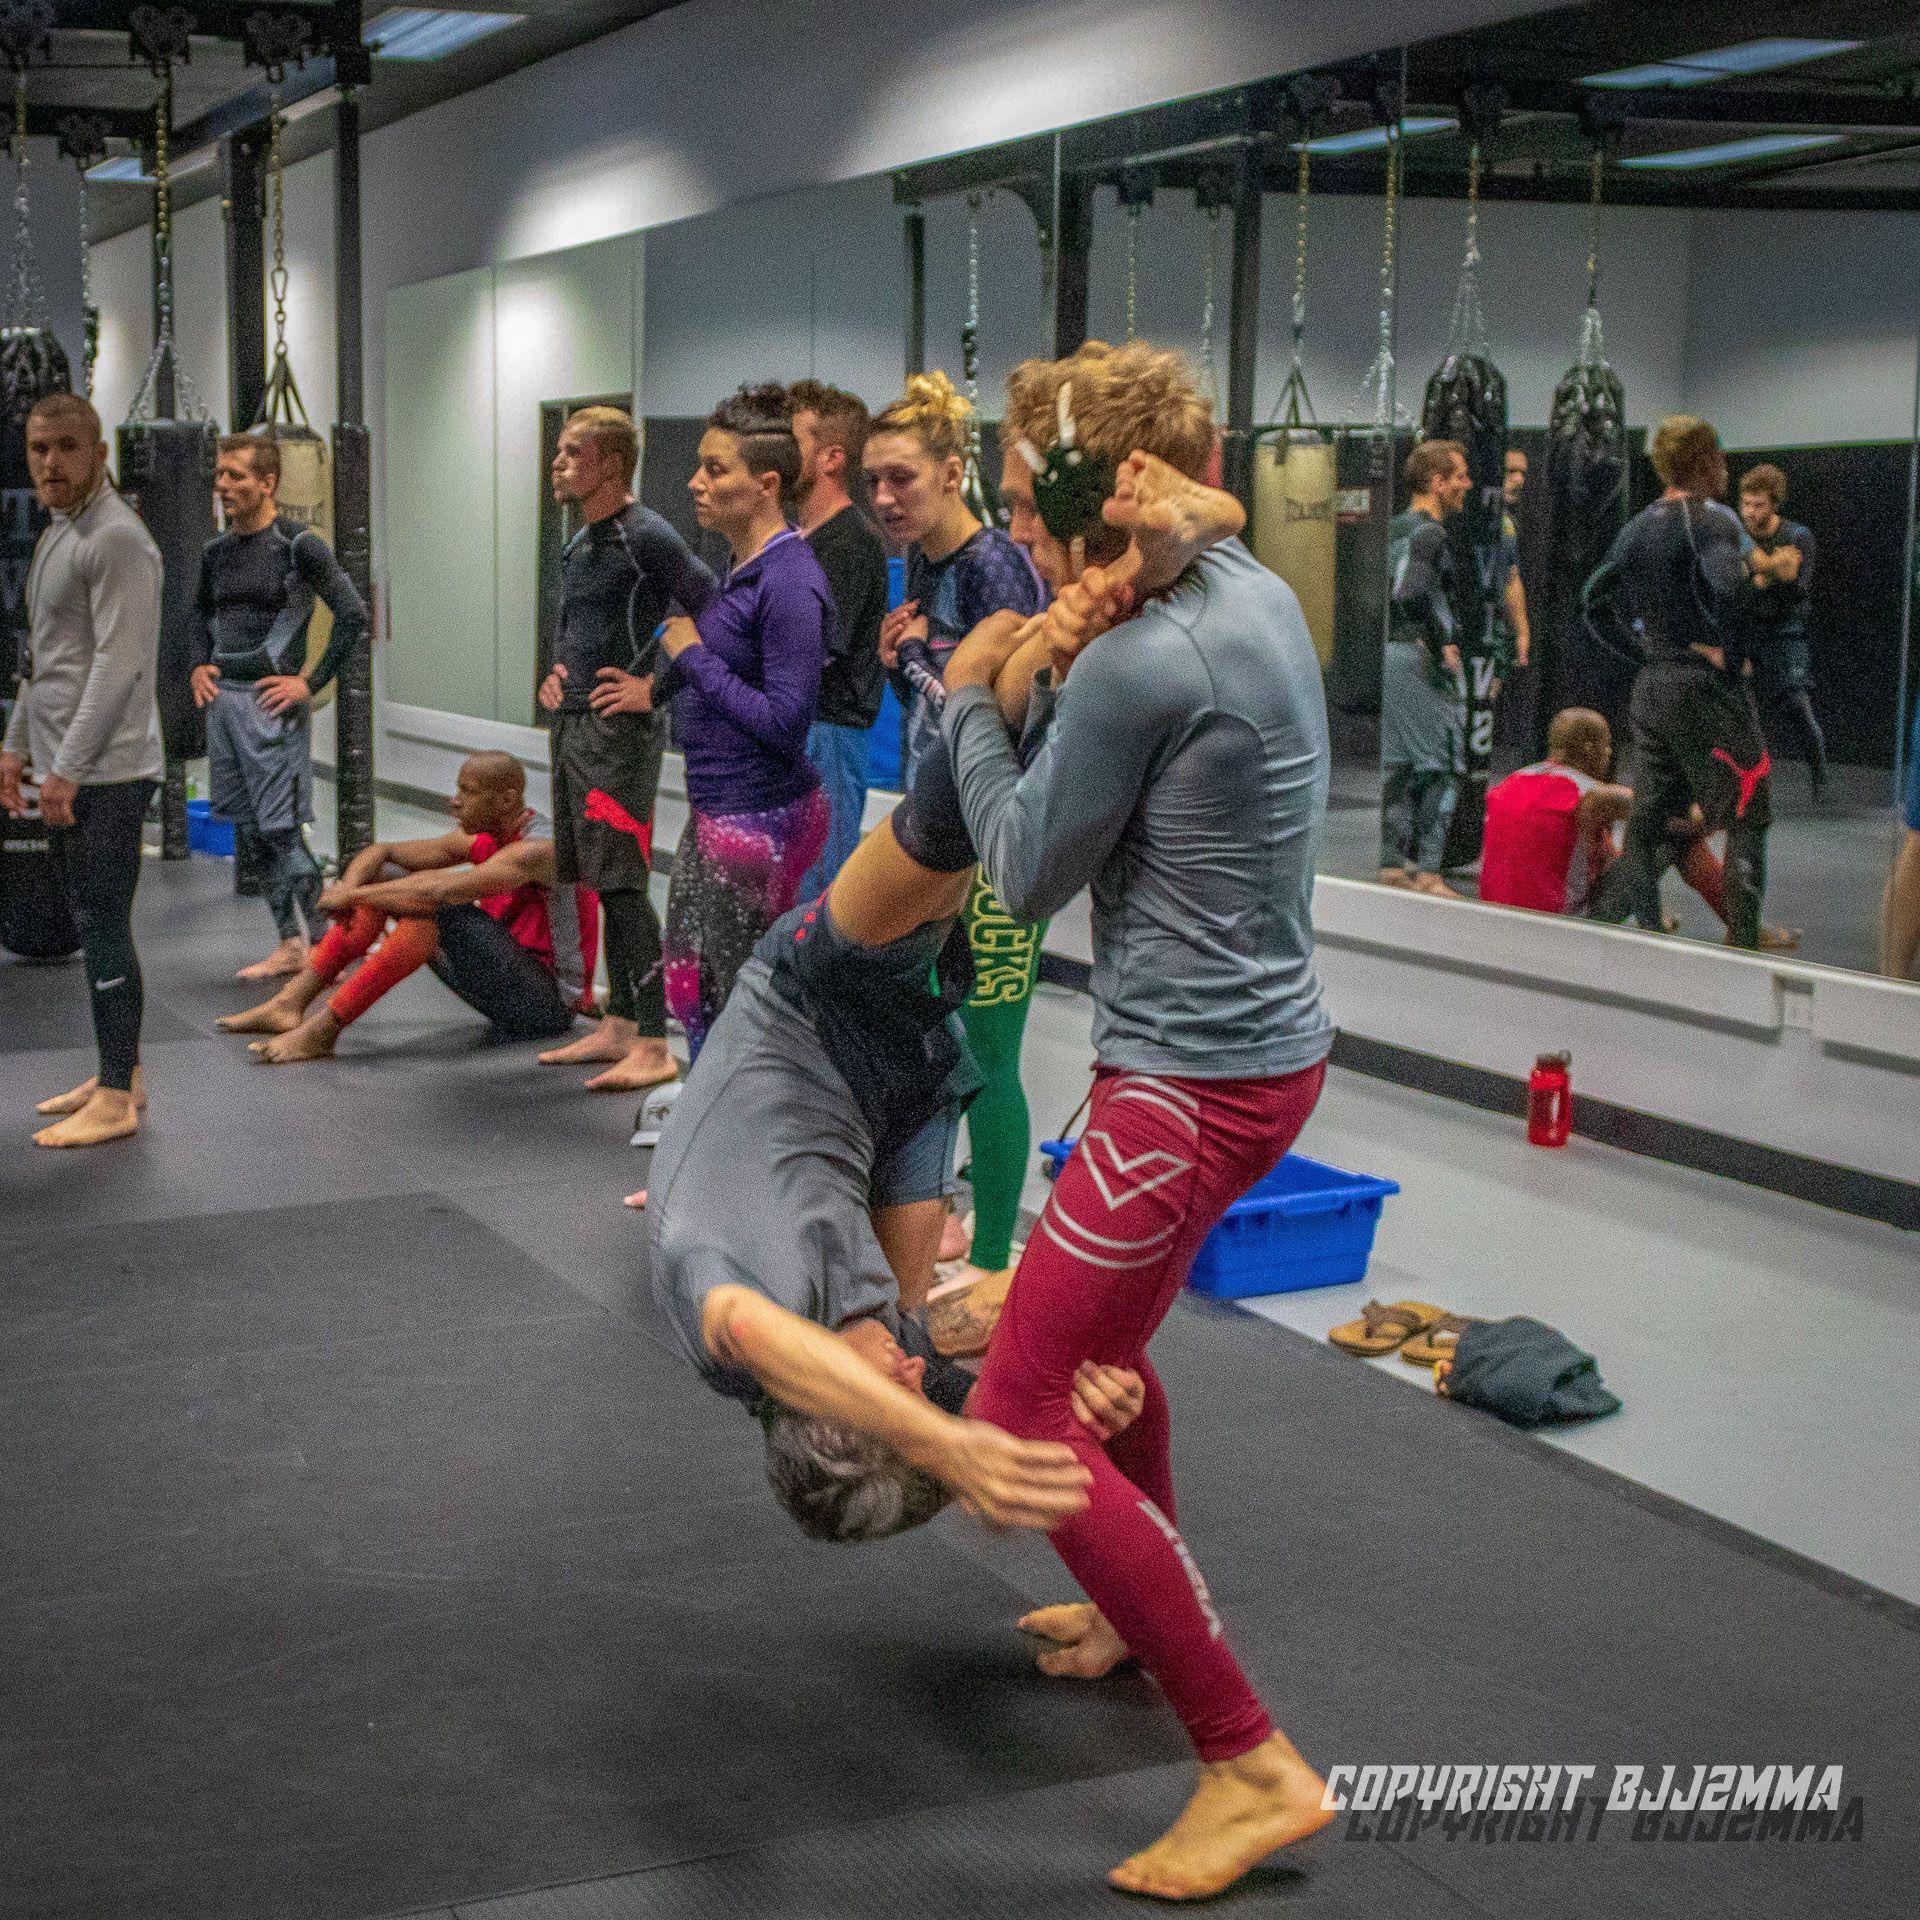 #BJJ2MMA #martialarts #fitness #photography #boxing fitnees photography